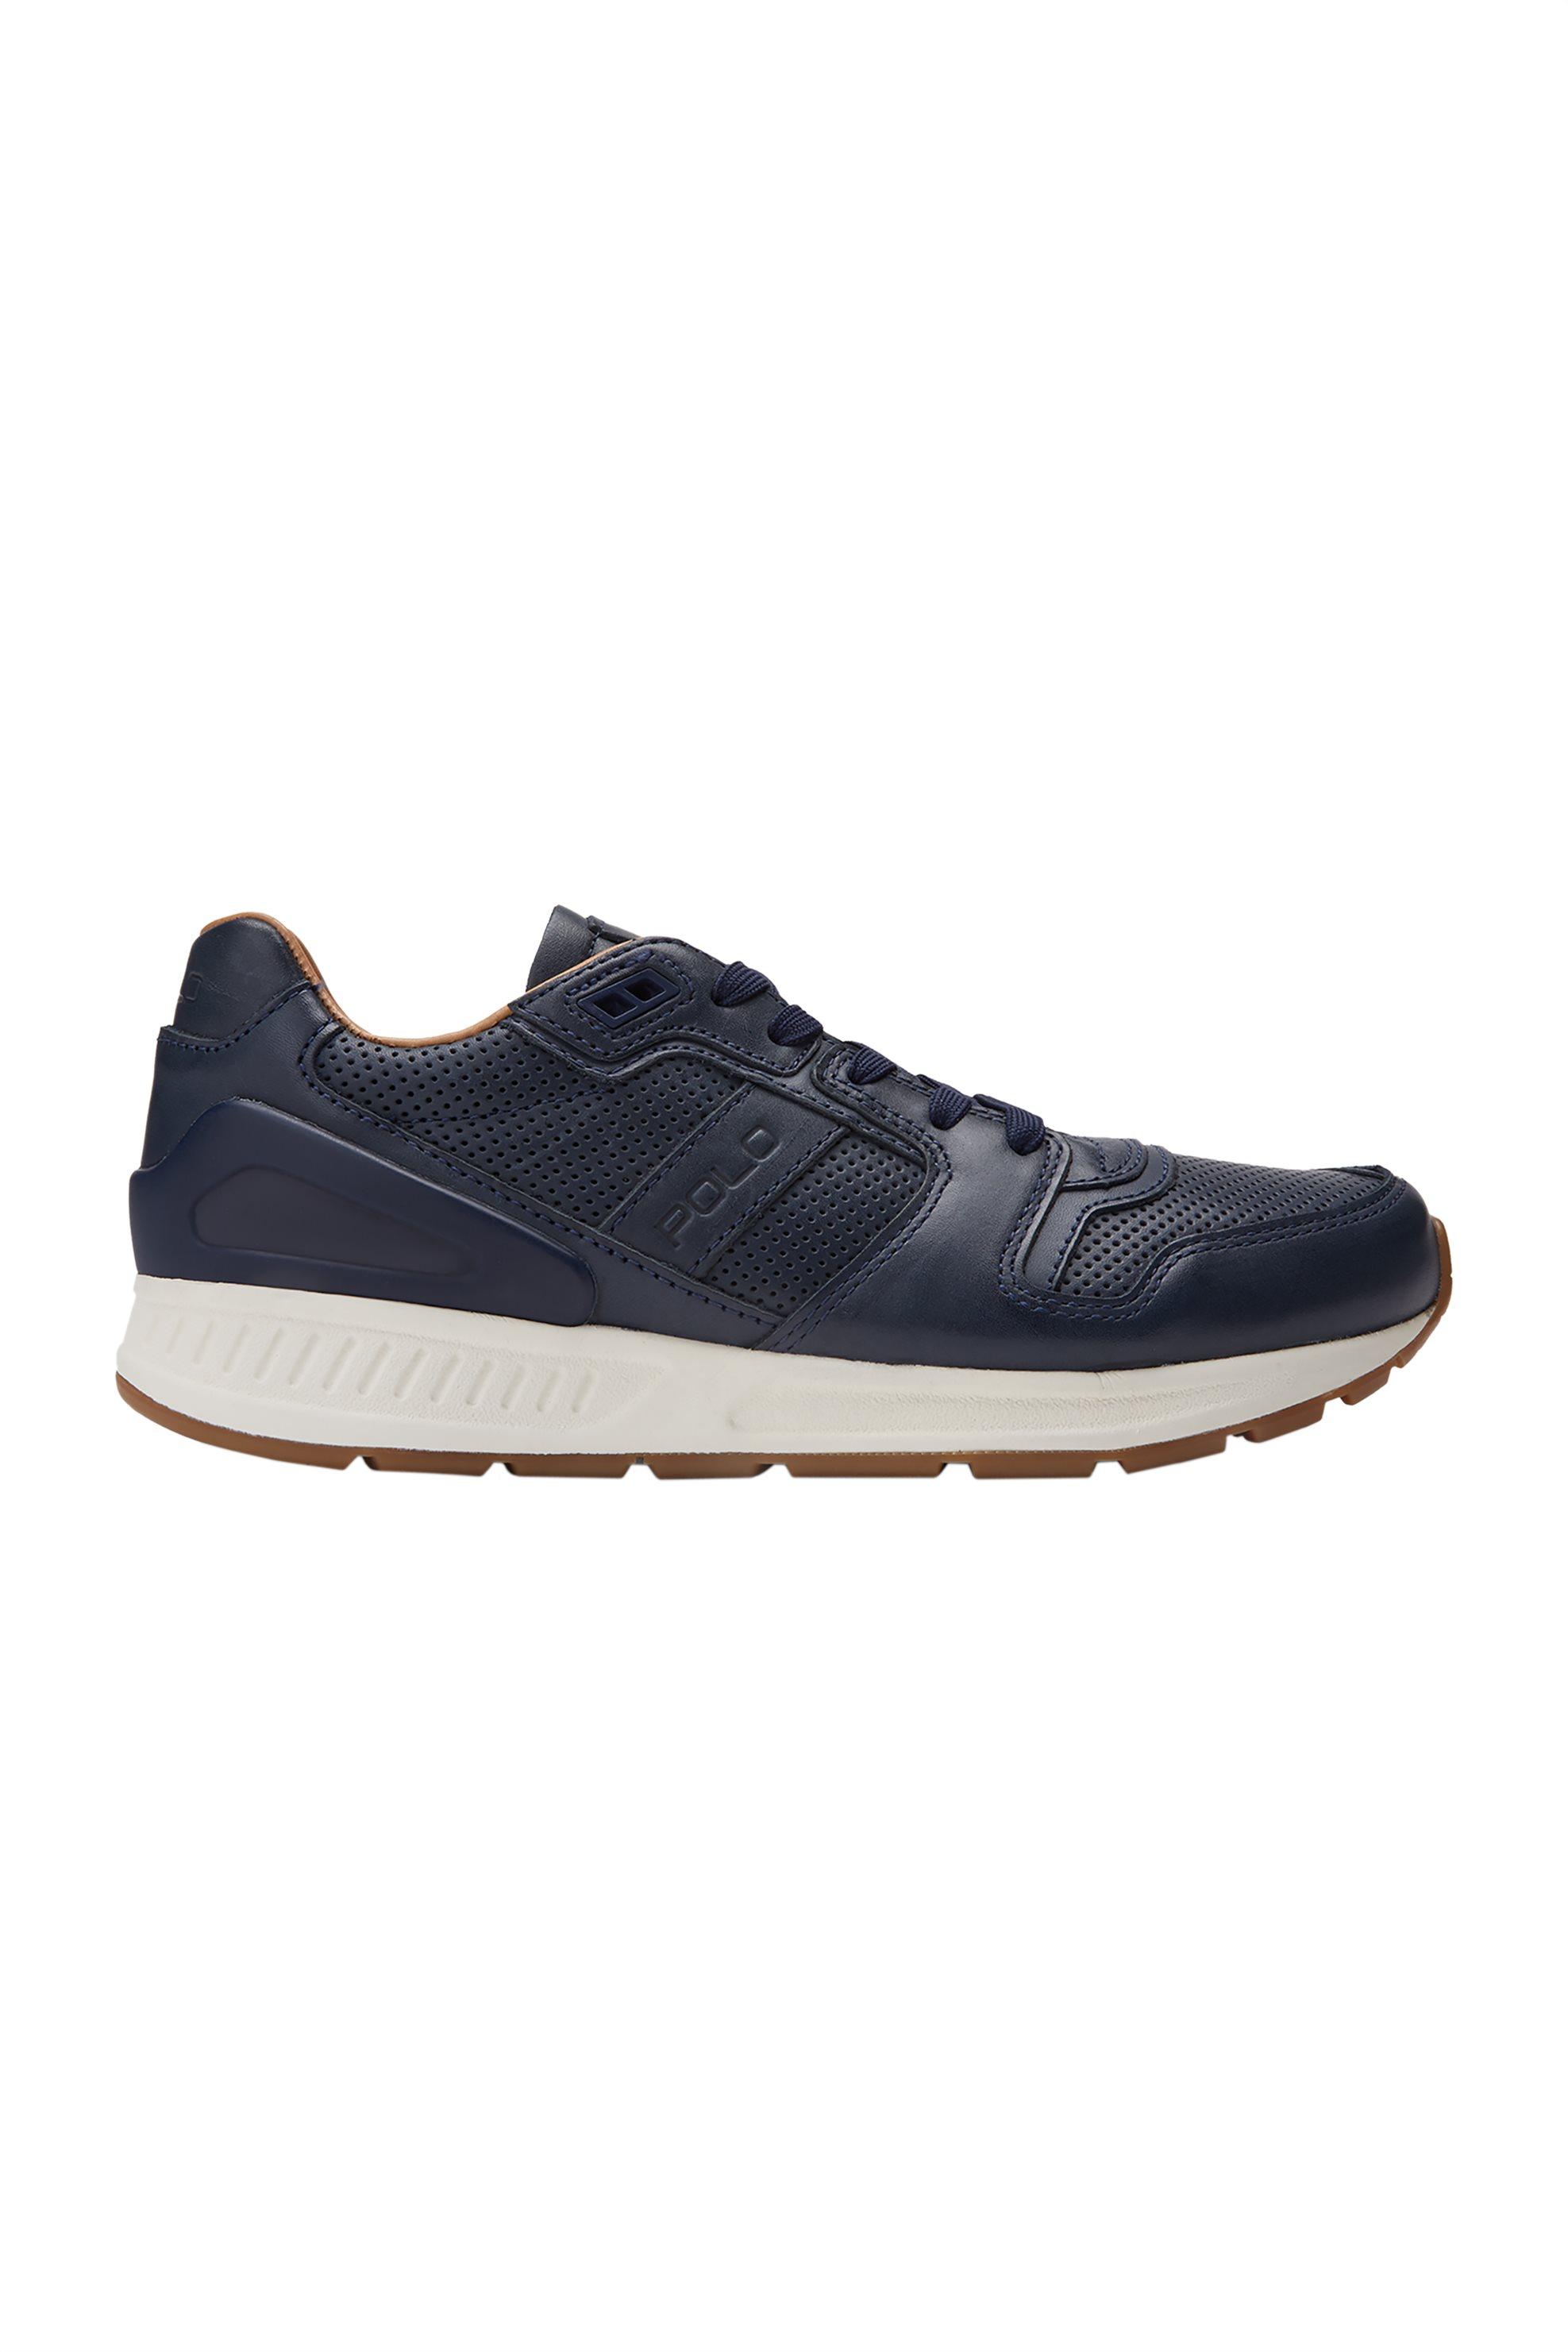 -60% Notos Polo Ralph Lauren ανδρικά παπούτσια δερμάτινα με κορδόνια –  809674774006 – Μπλε Σκούρο 28306eb5e8e